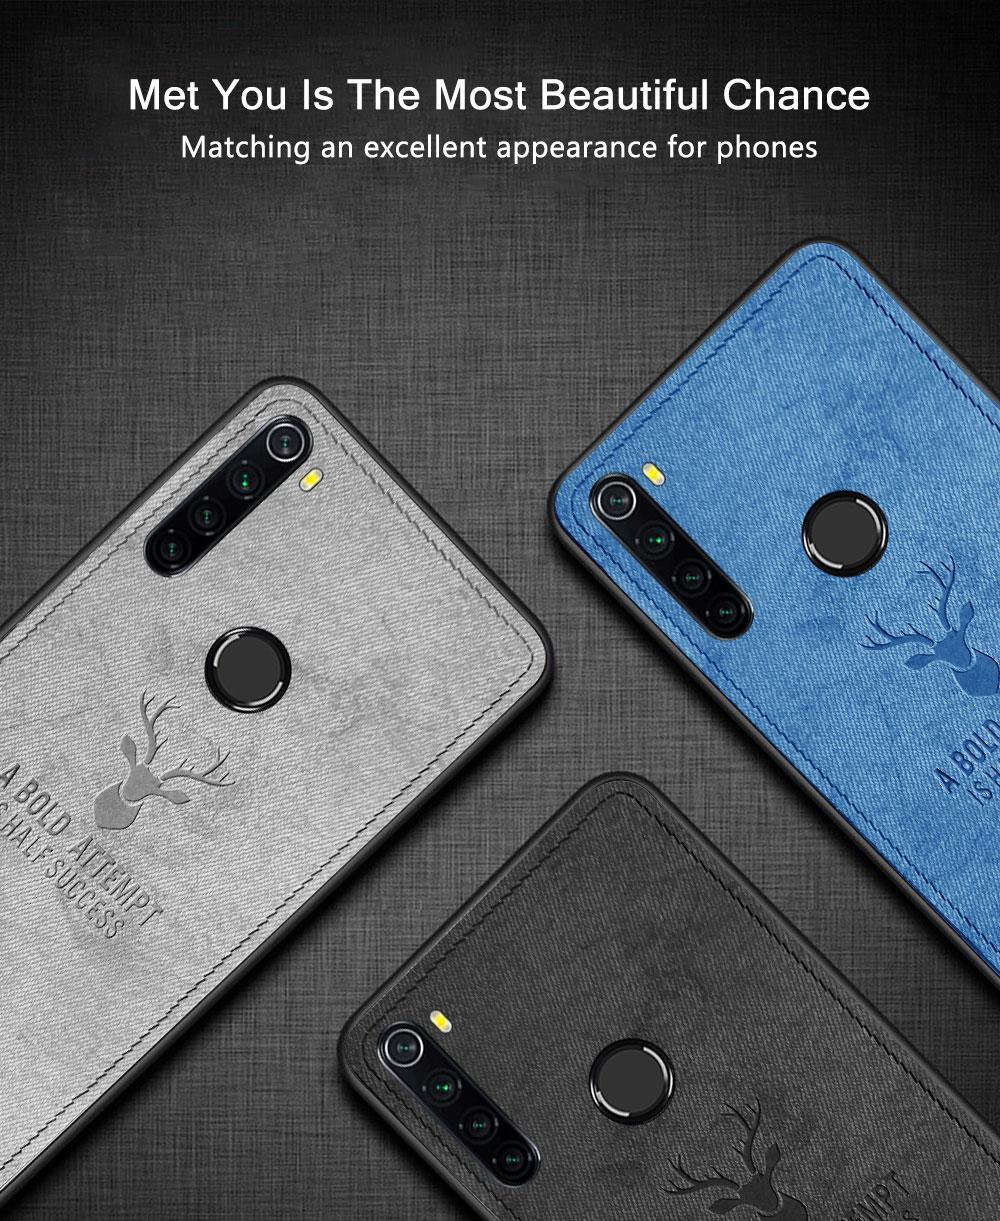 Чохли Deer для Xiaomi Redmi Note 8 / бампер накладка / Скла в наявності /